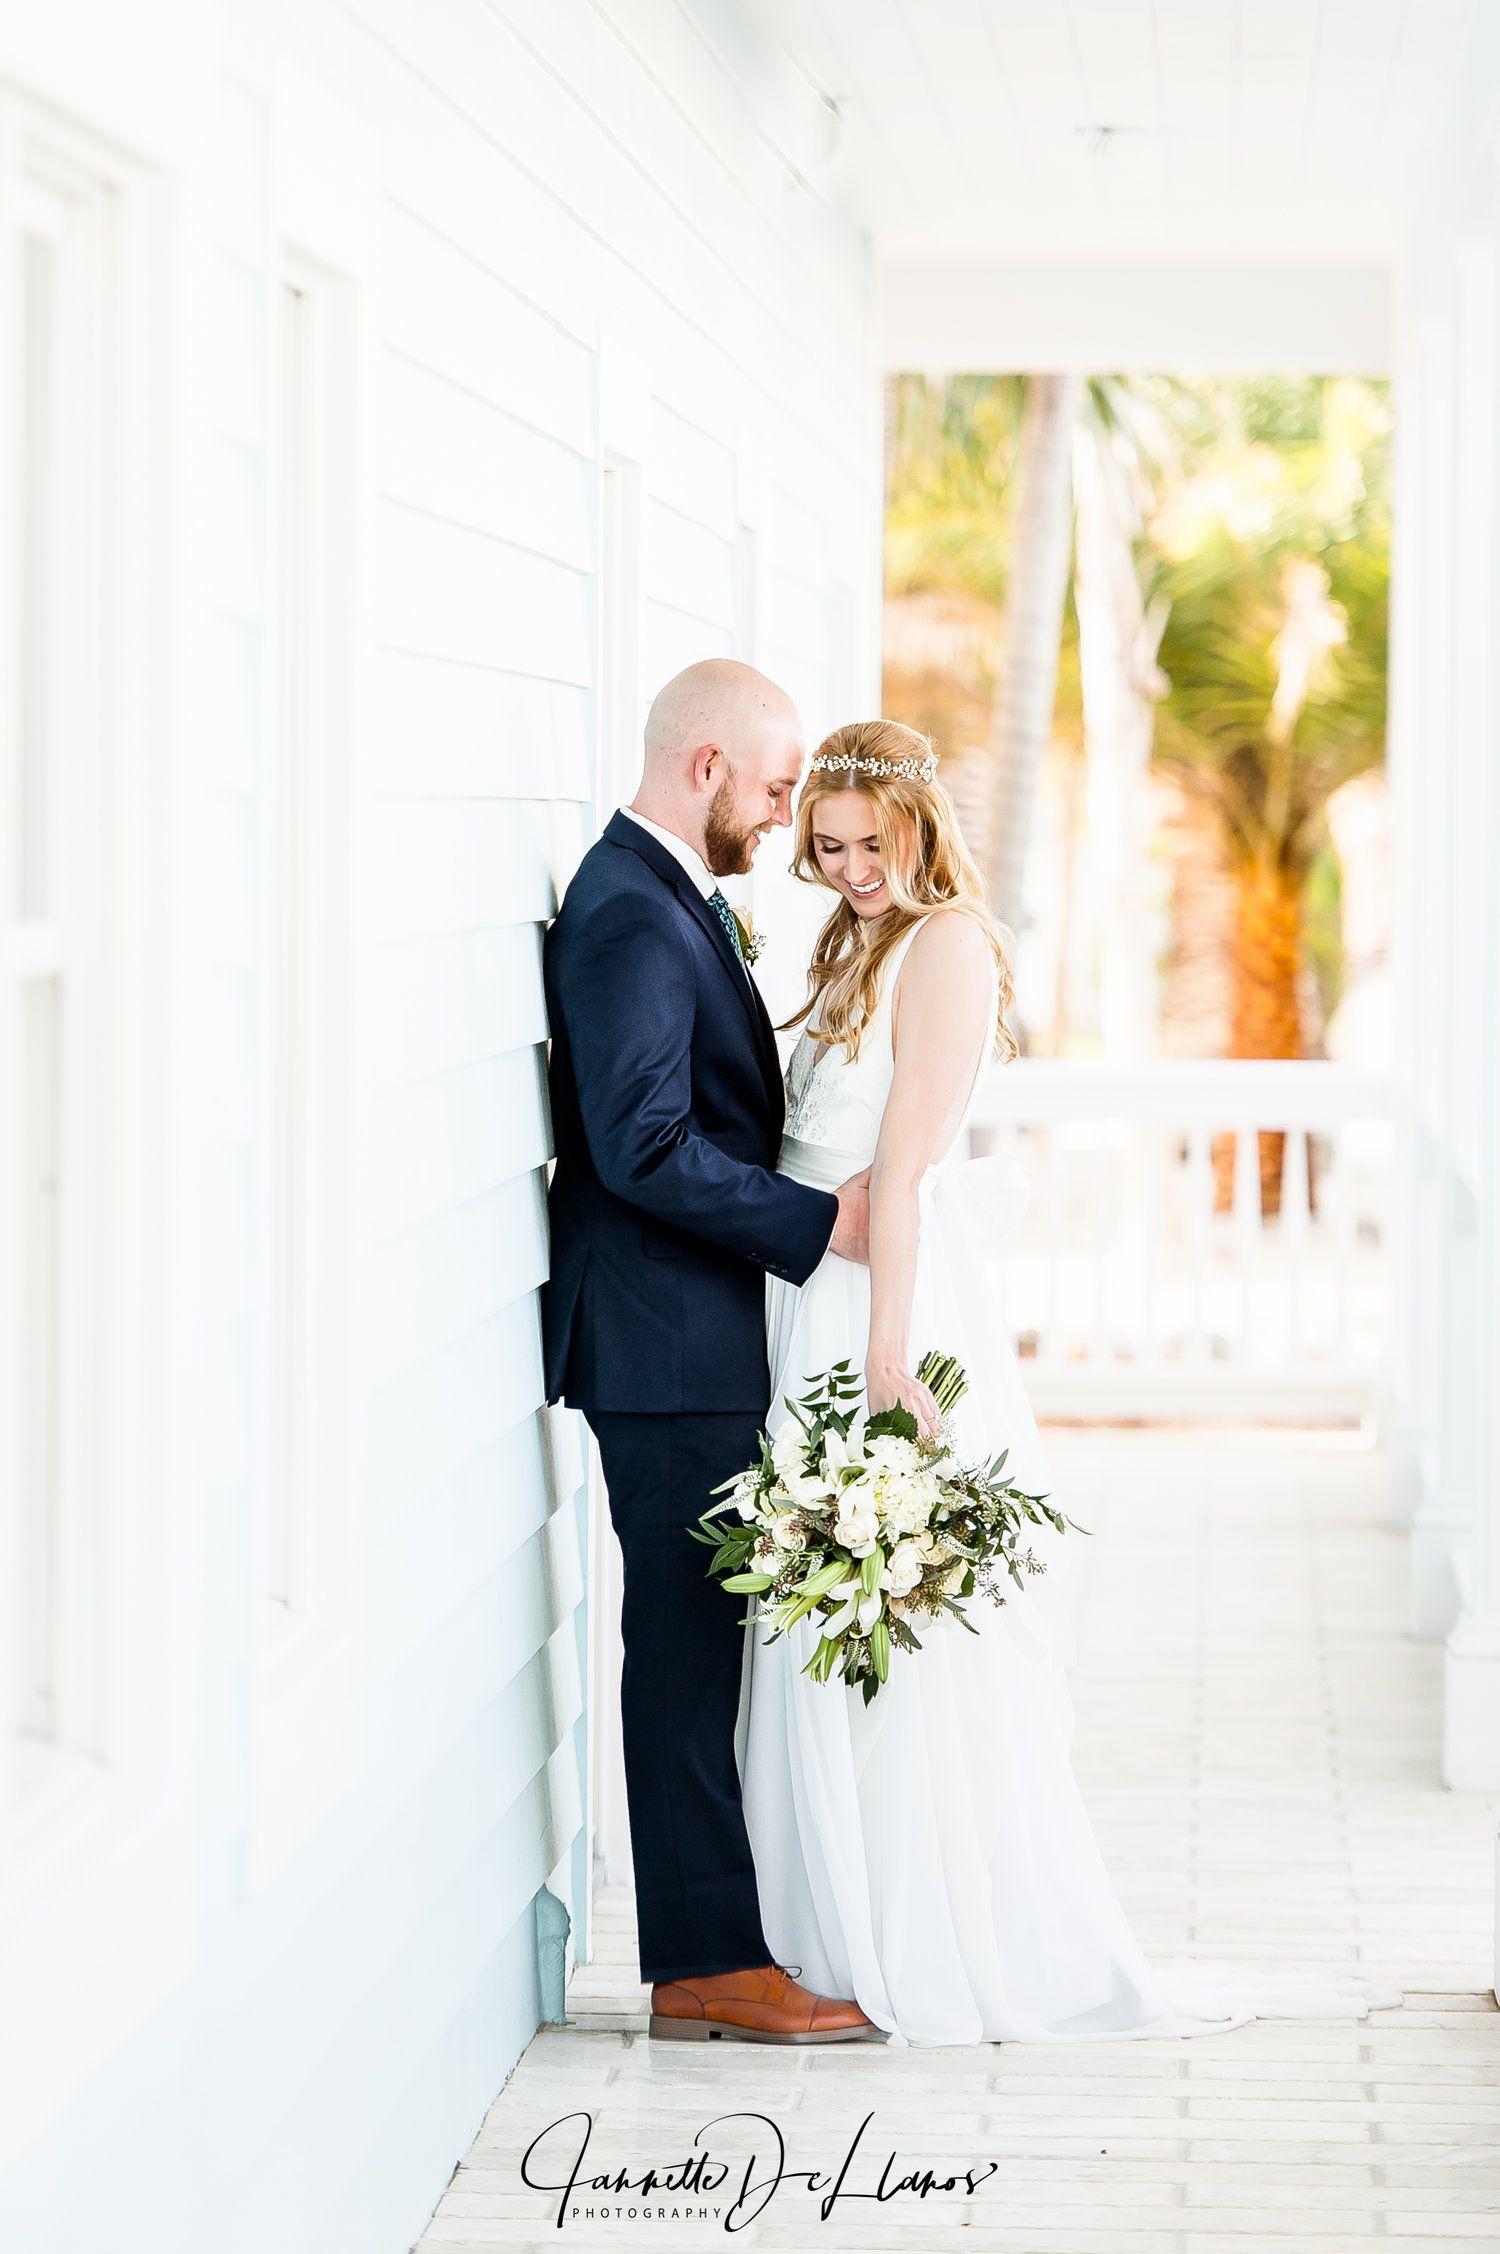 Wedding Photographer In The Florida Keys Jannette De Llanos